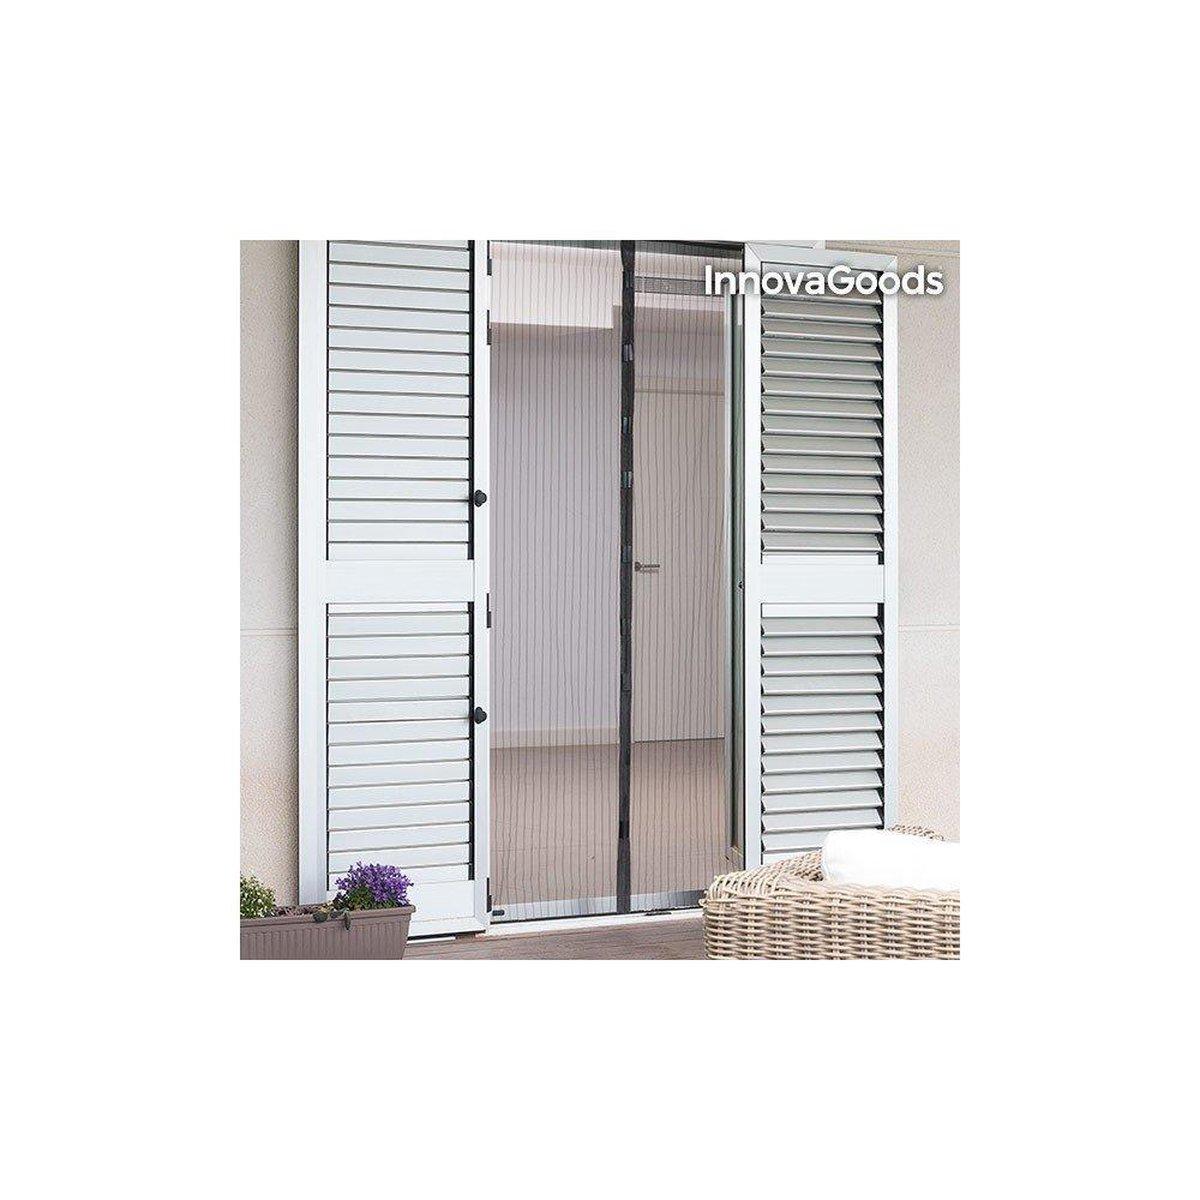 Guard 'n Care Deurhor - 100 x 220 cm - Magnetisch - Zwart